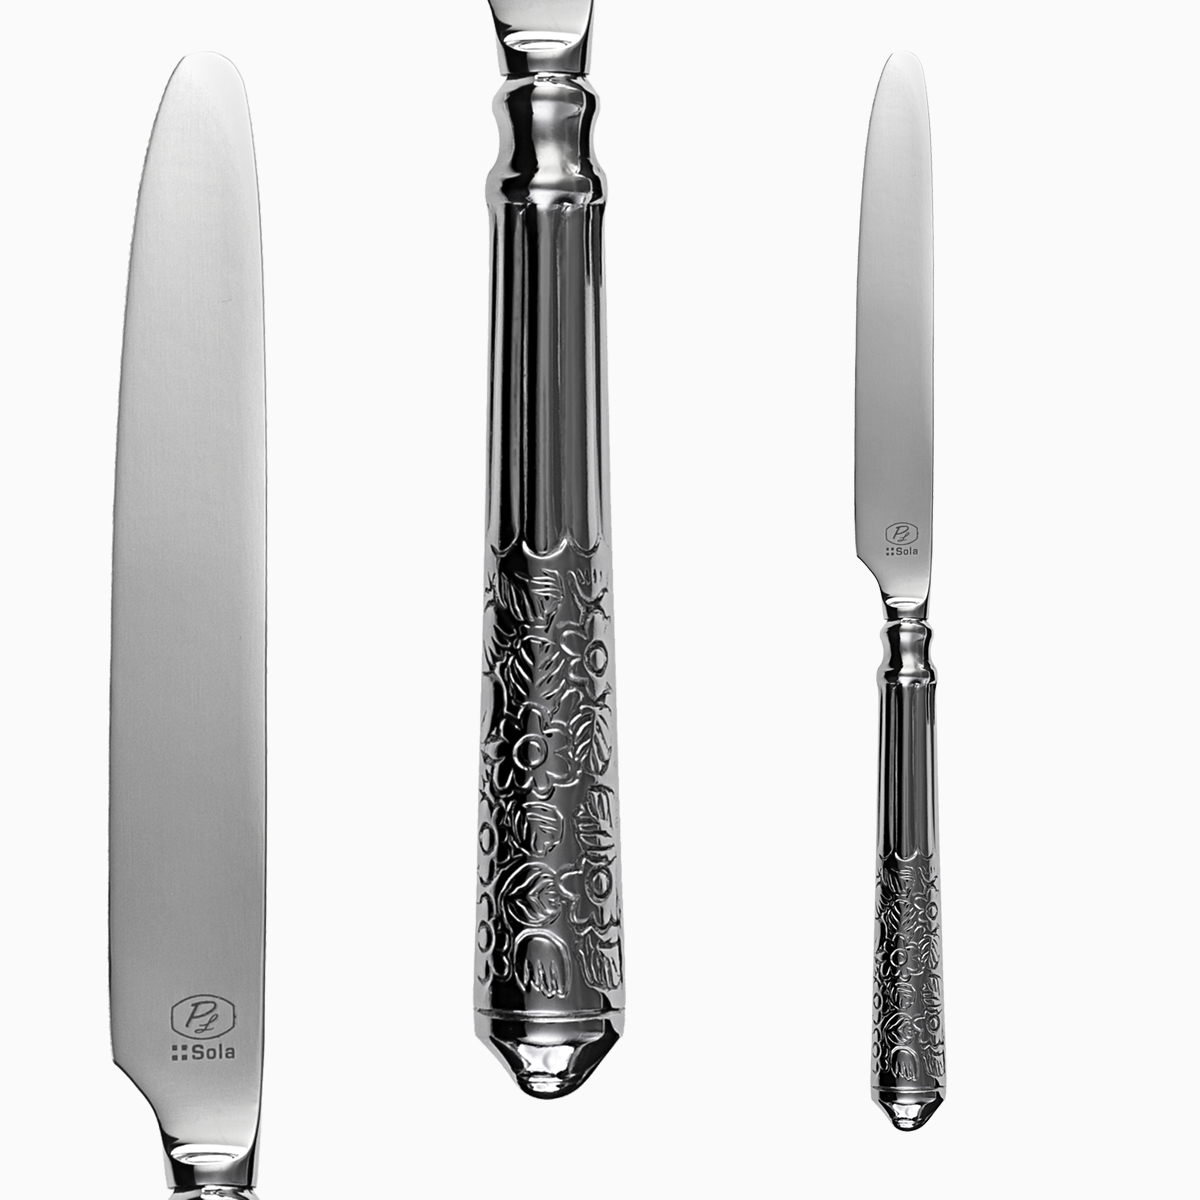 Table knife - San Remo